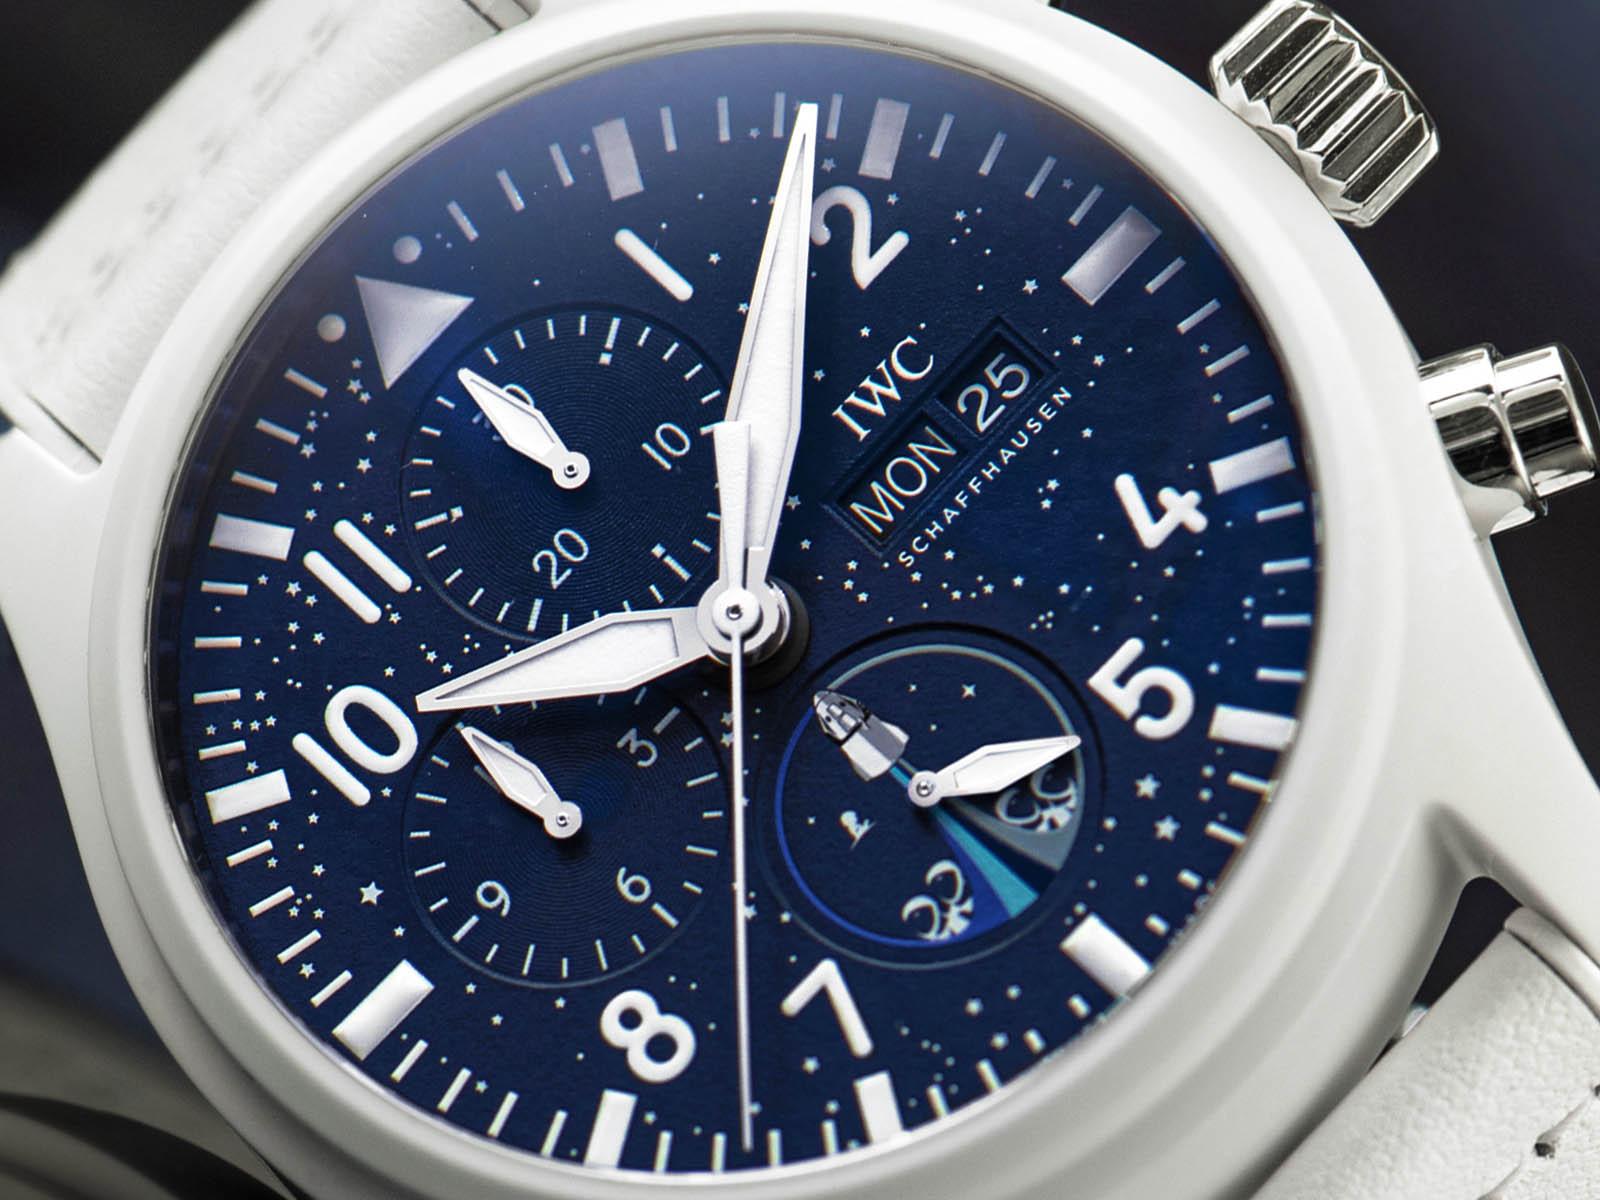 iw389110-iwc-pilot-s-watch-chronograph-edition-inspiration4-5.jpg